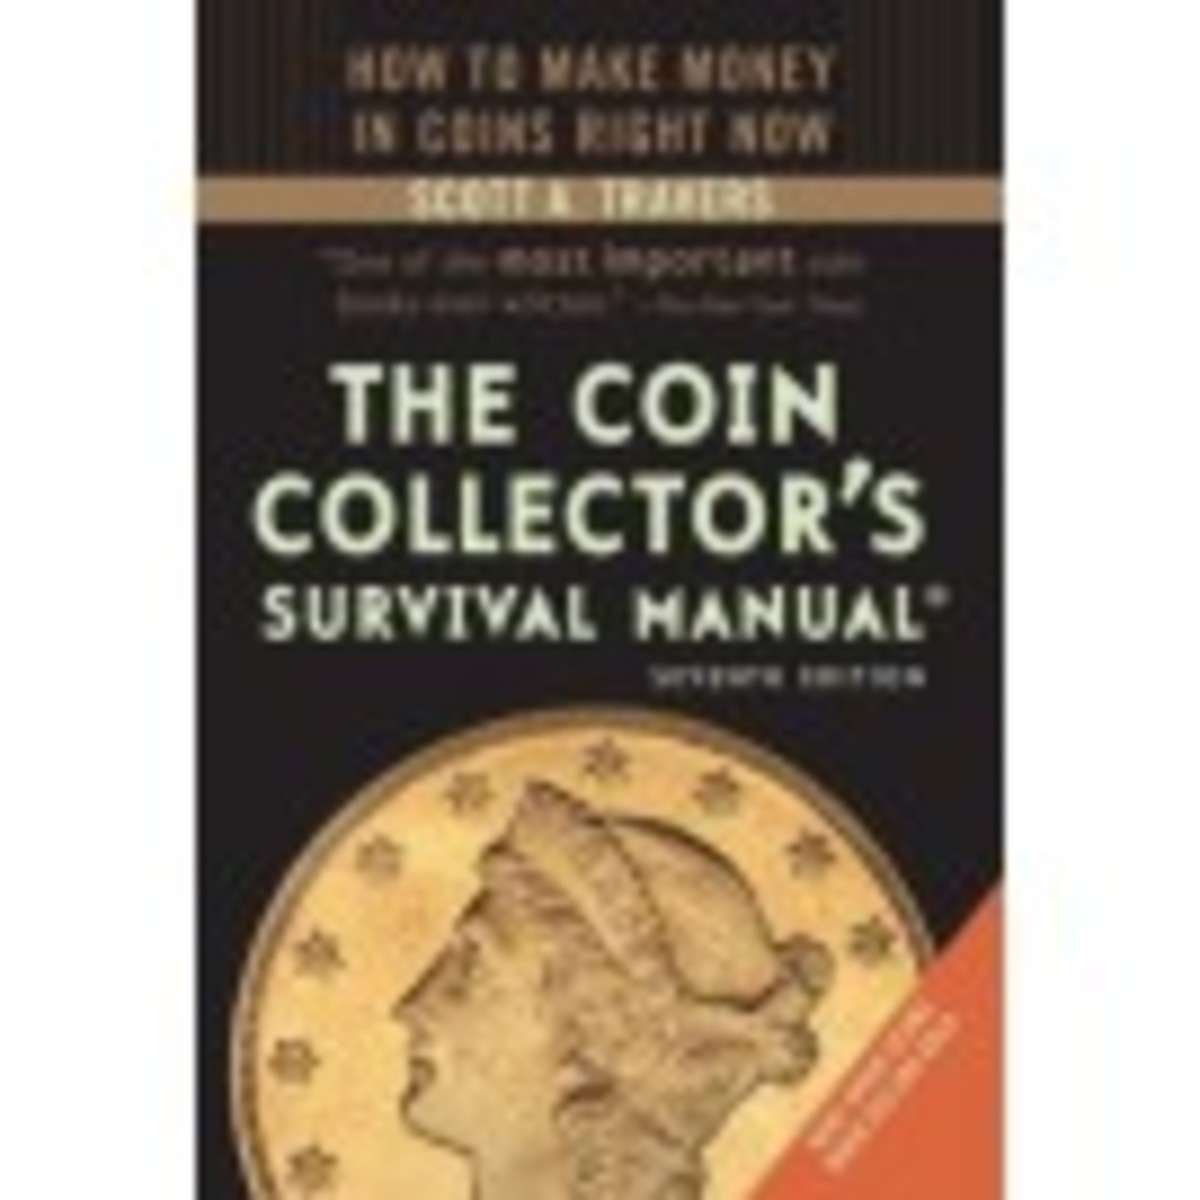 The Coin Collector's Survival Manual,